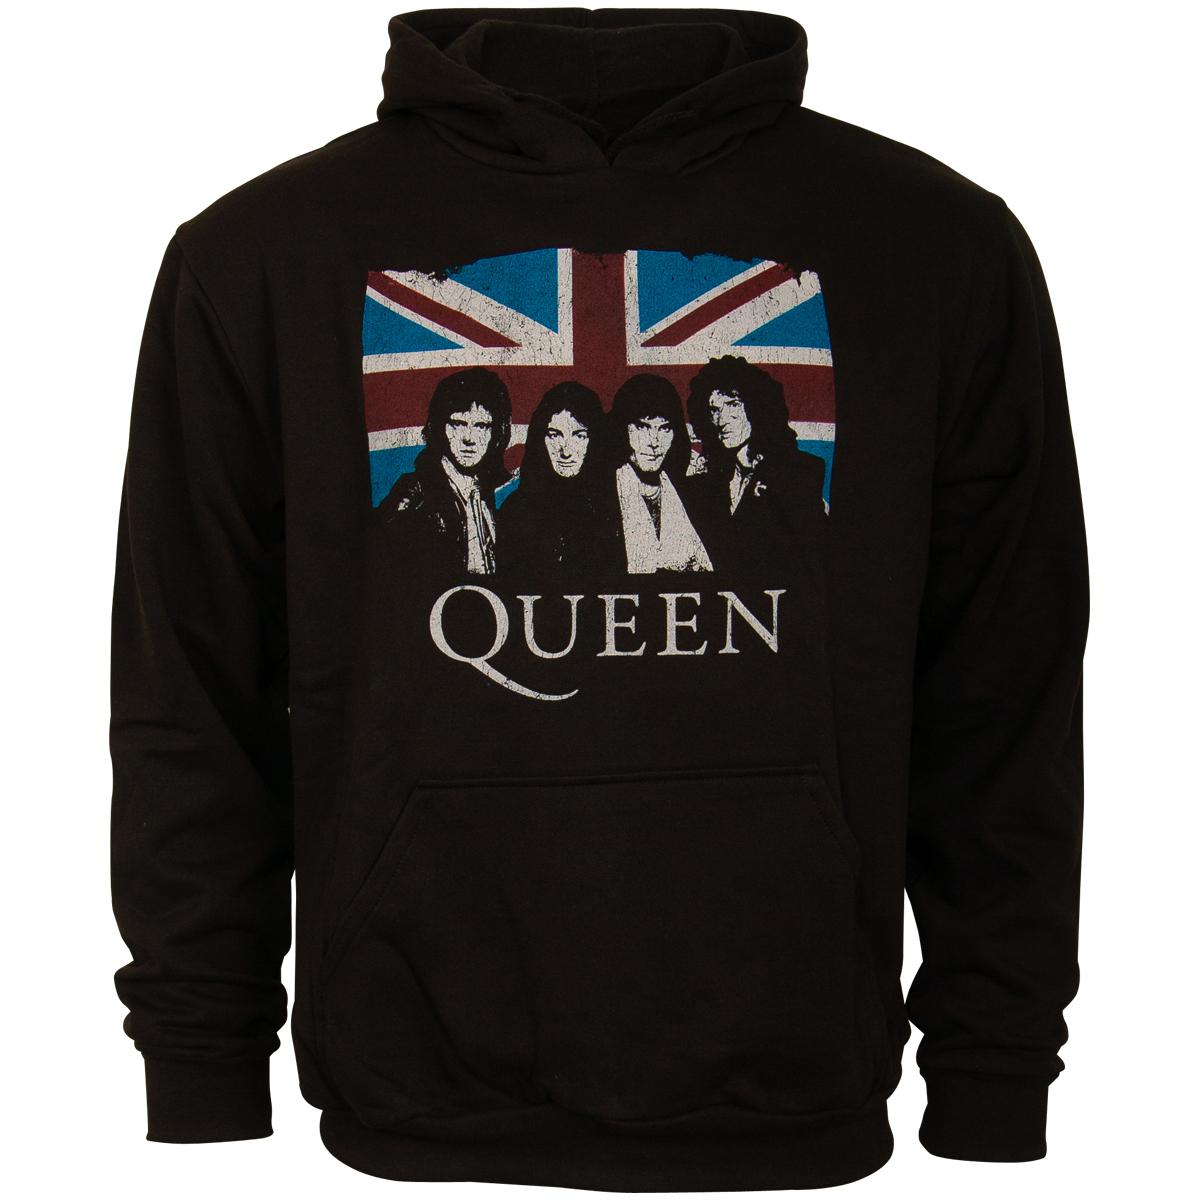 Queen - Kapuzenpullover Vintage Union Jack - schwarz